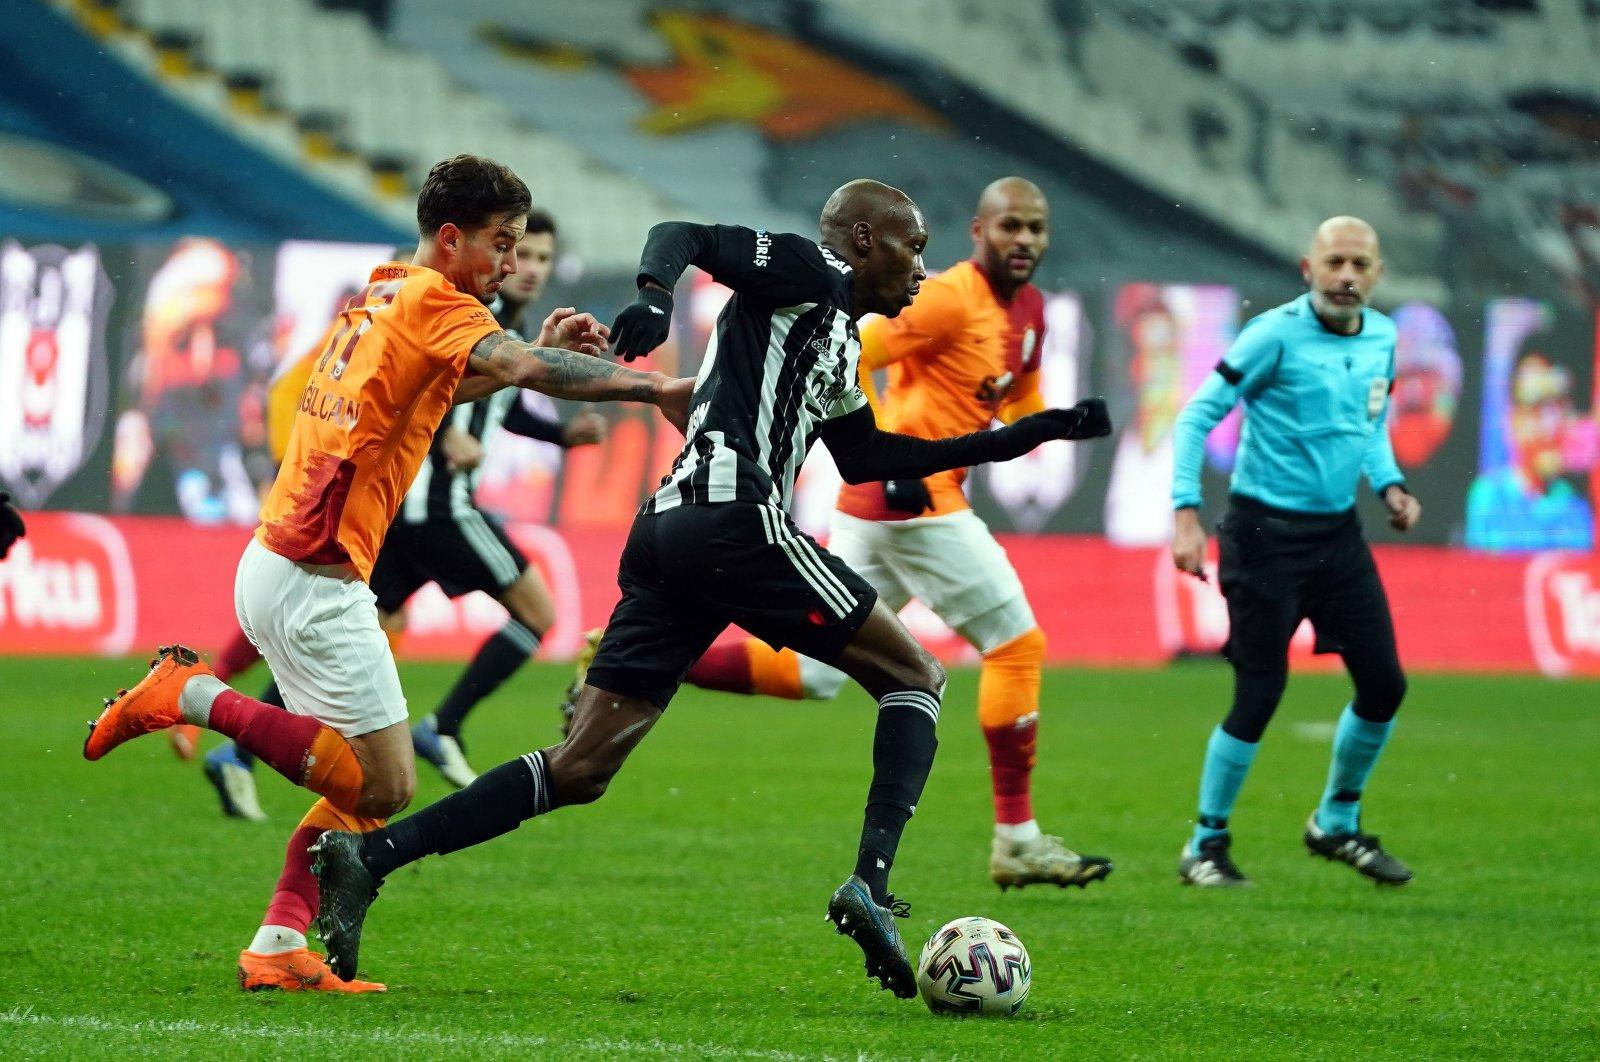 Beşiktaş's Aatiba Hutchinson dribbles past Galatasaray's Oğulcan Çağlayan during a Süper Lig match in Istanbul, Turkey, Jan. 17, 2021. (IHA Photo)